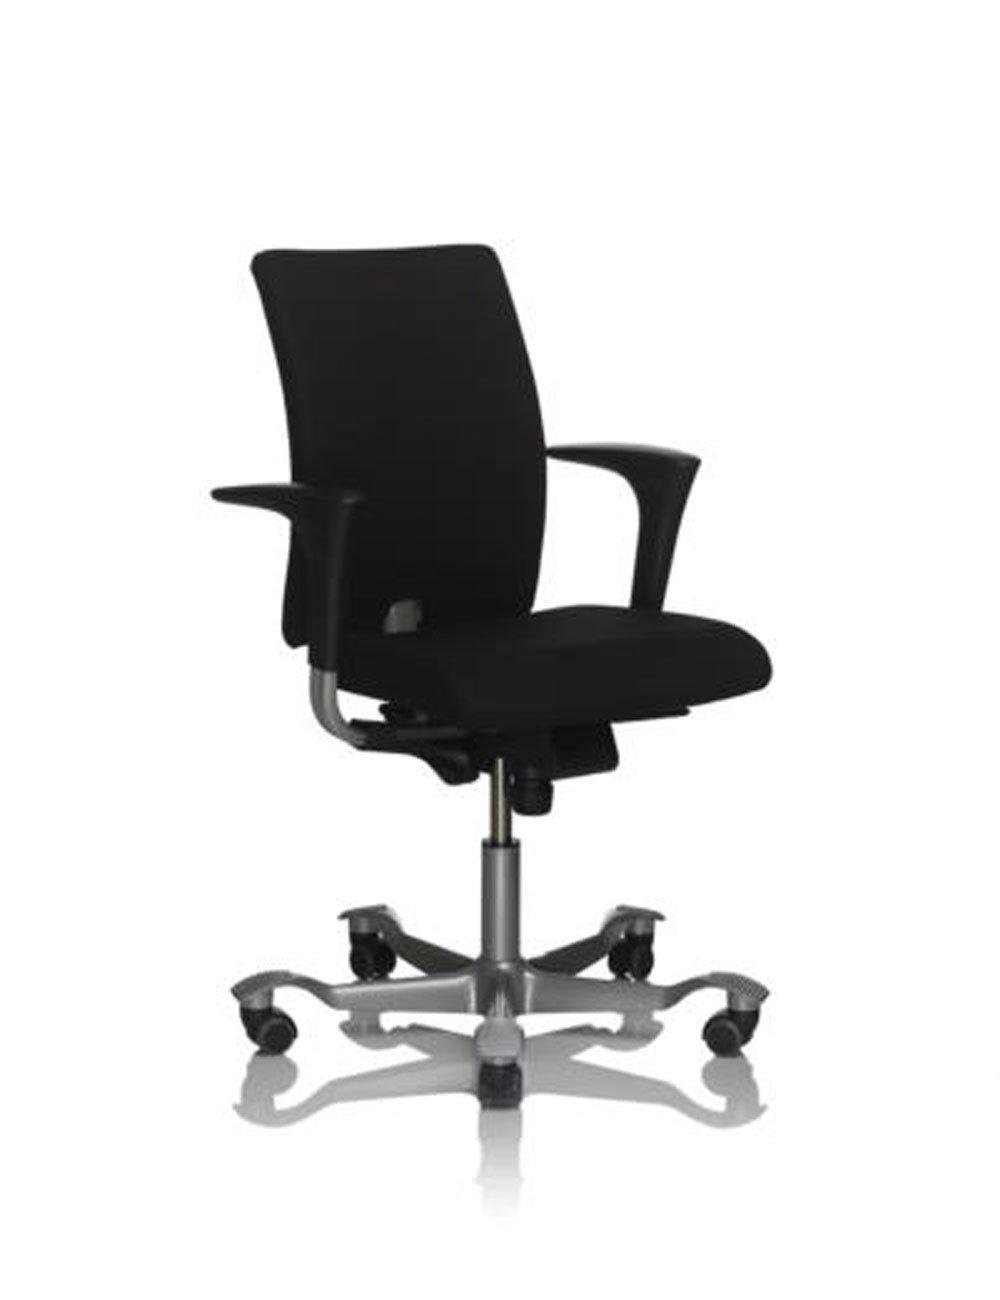 Remarkable Hag Ho4 Credo 4600 Machost Co Dining Chair Design Ideas Machostcouk